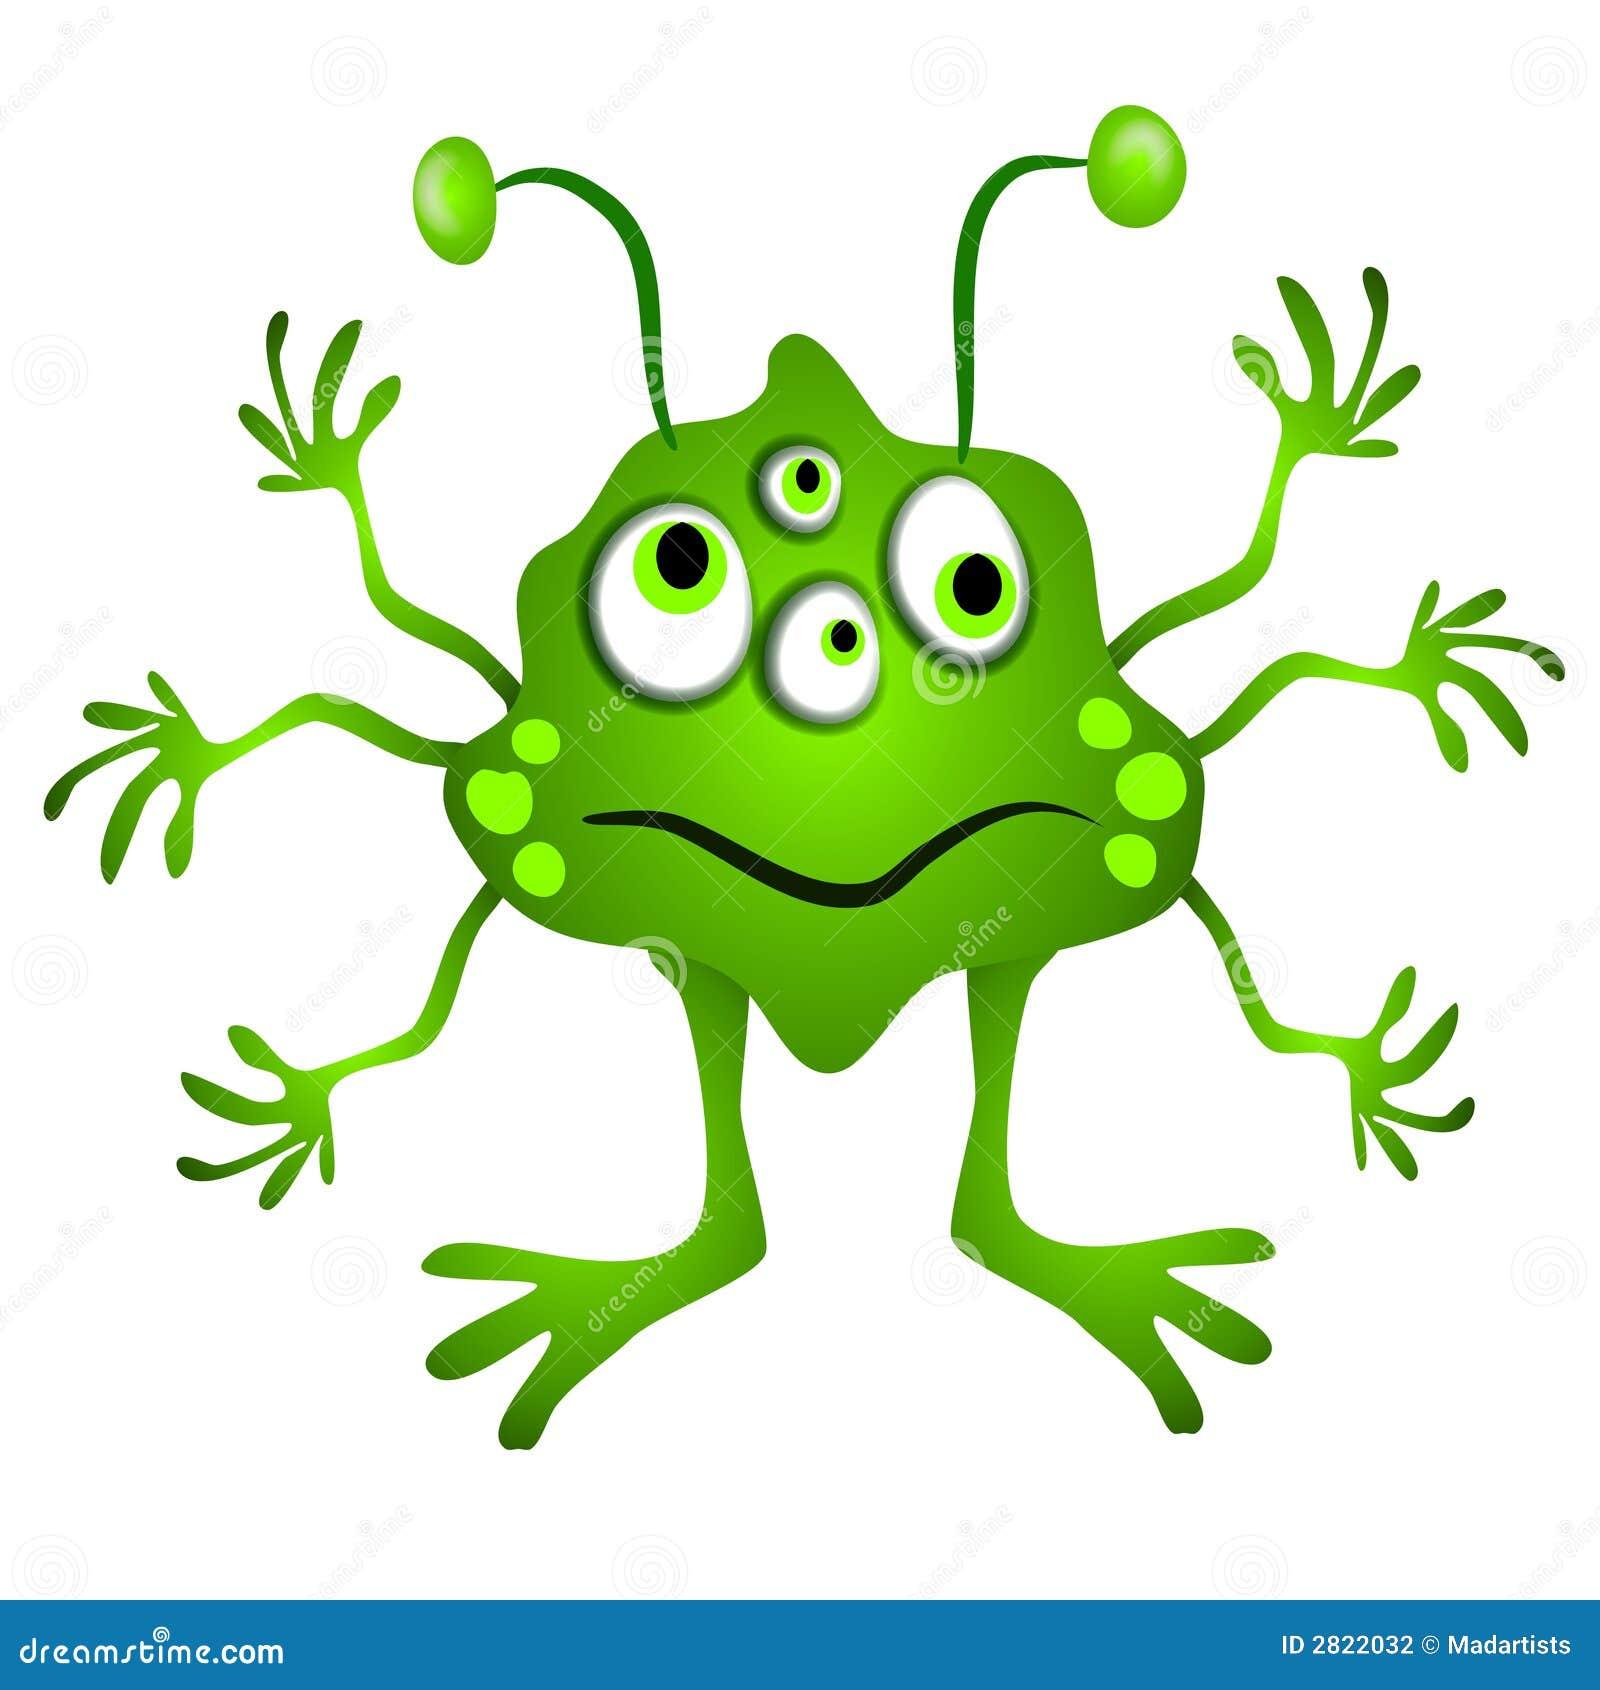 cartoon clip art illustration of a little green alien man (or woman ...